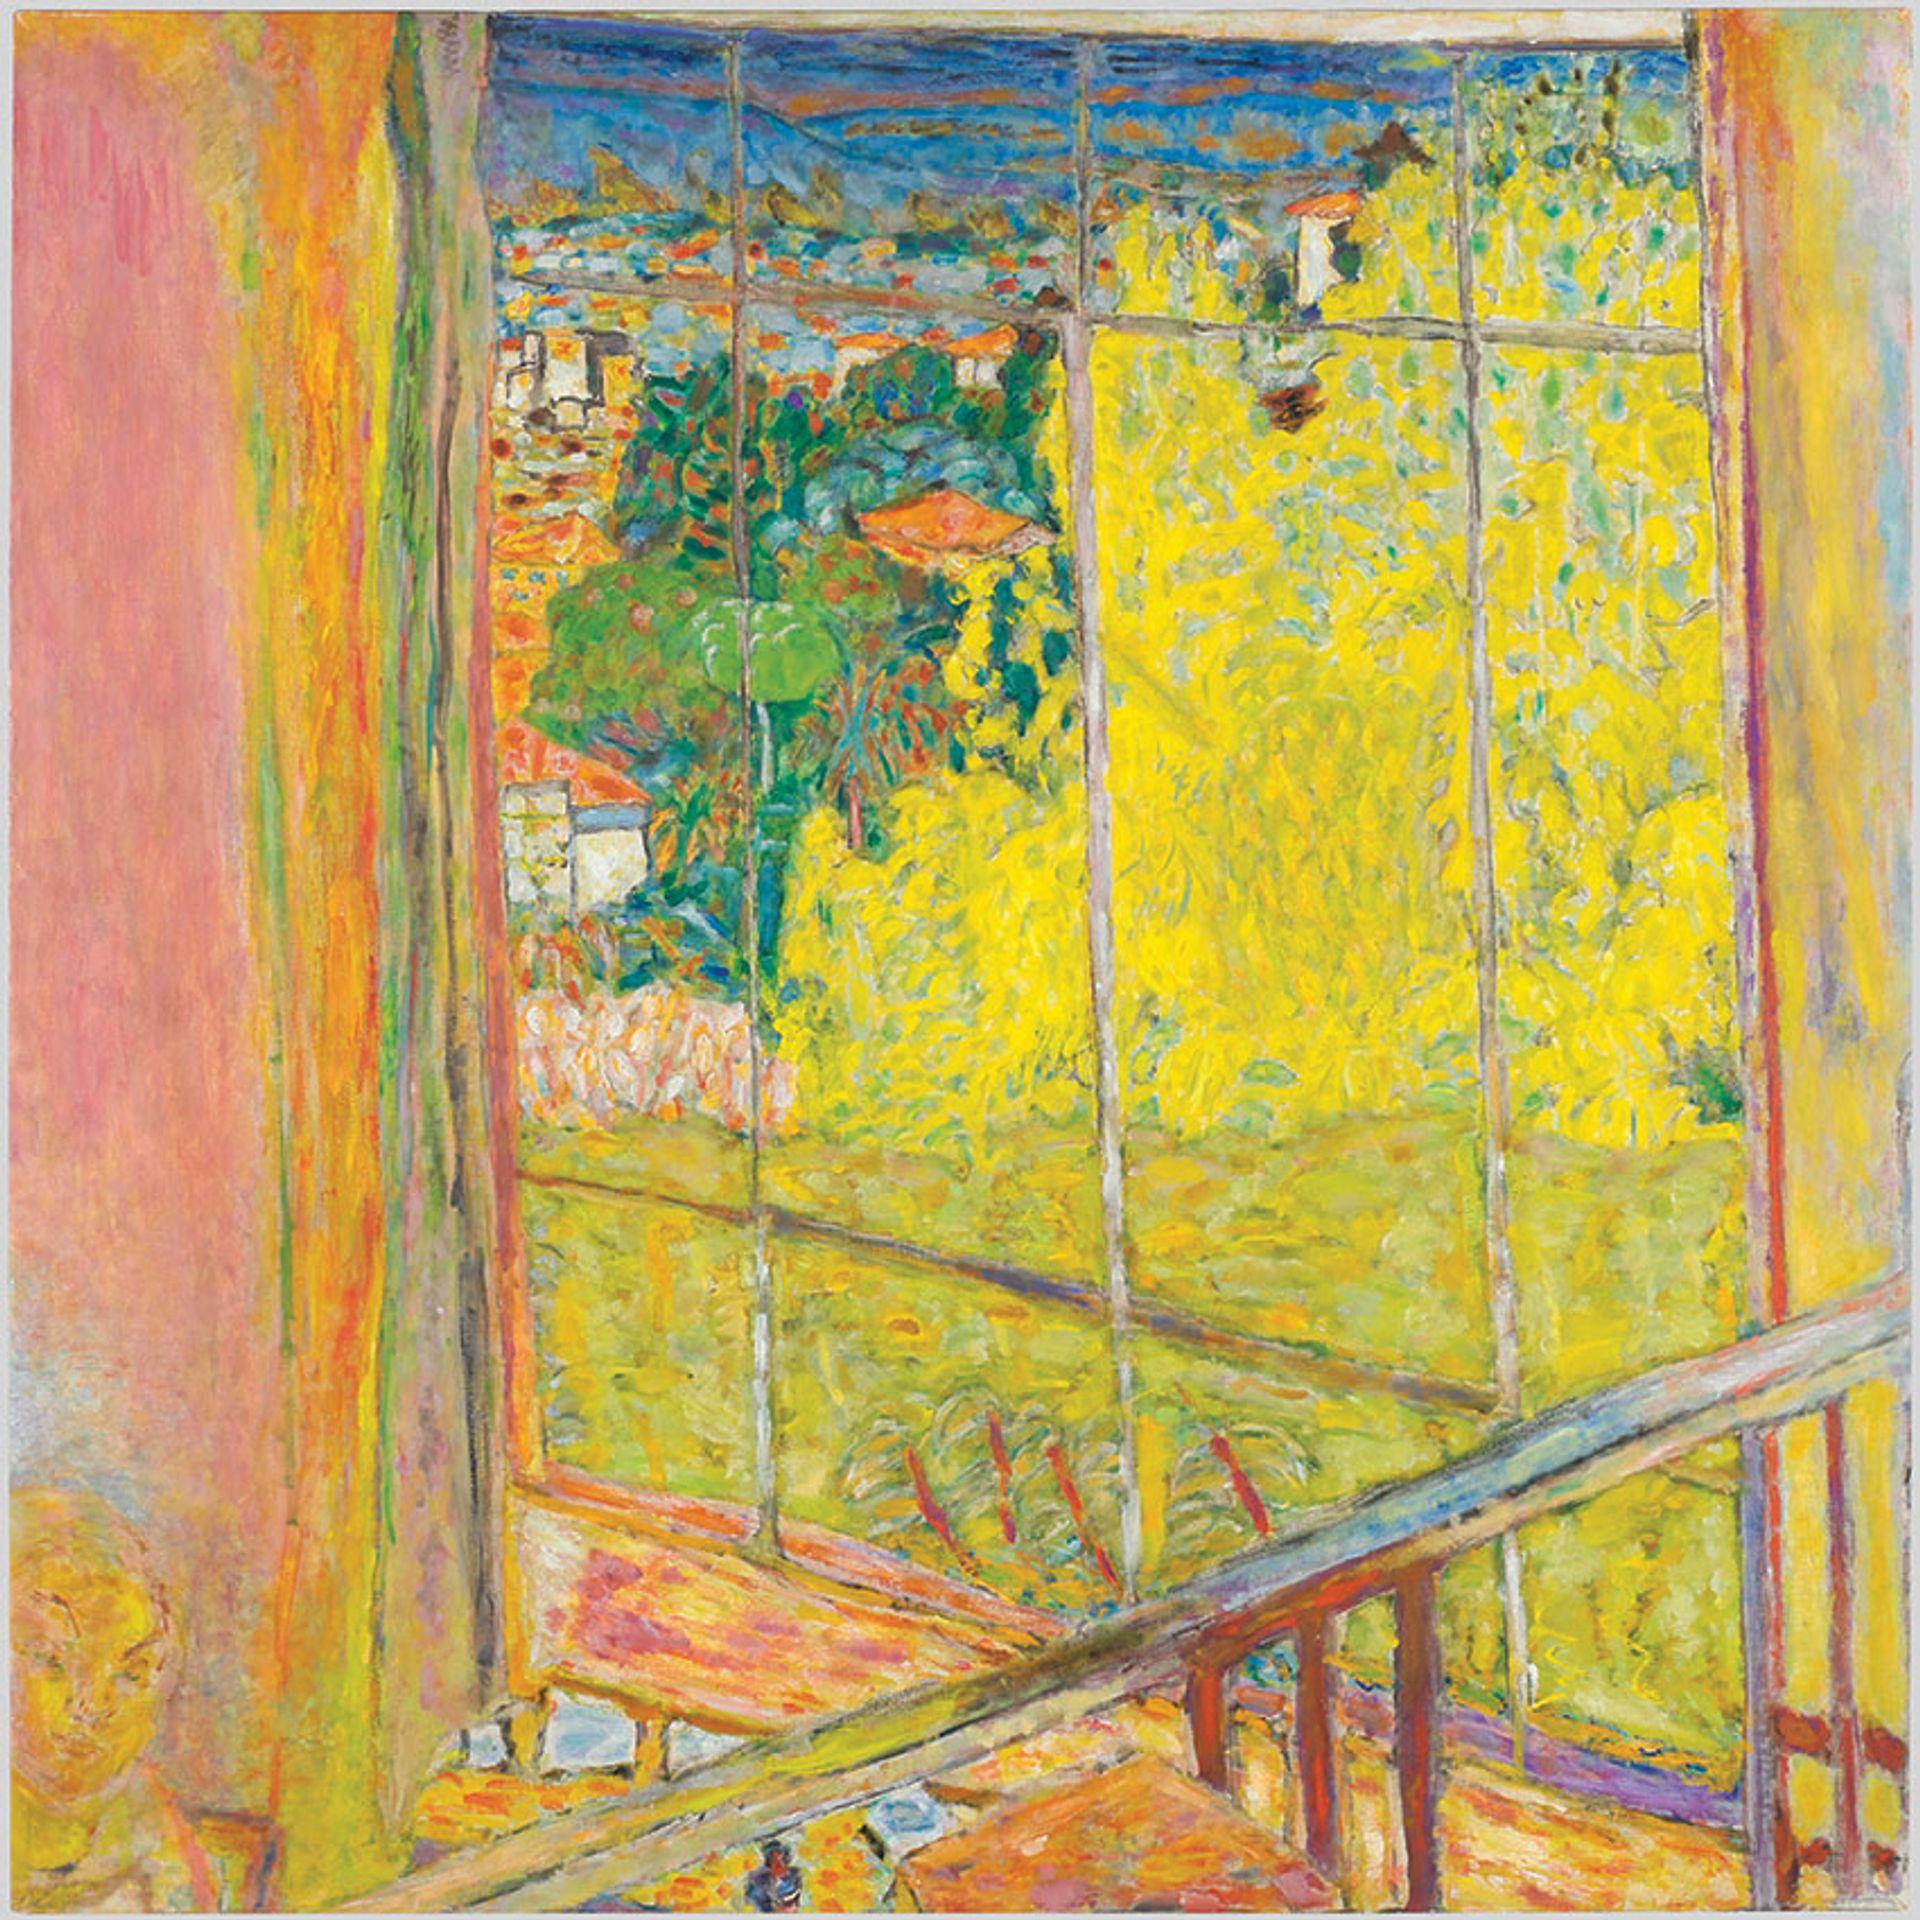 Dense with detail: Pierre Bonnard's The Studio with Mimosa (1939-46) Bertrand Prévost, © Centre Pompidou/MNAM-CCI/RMN-Grand Palais